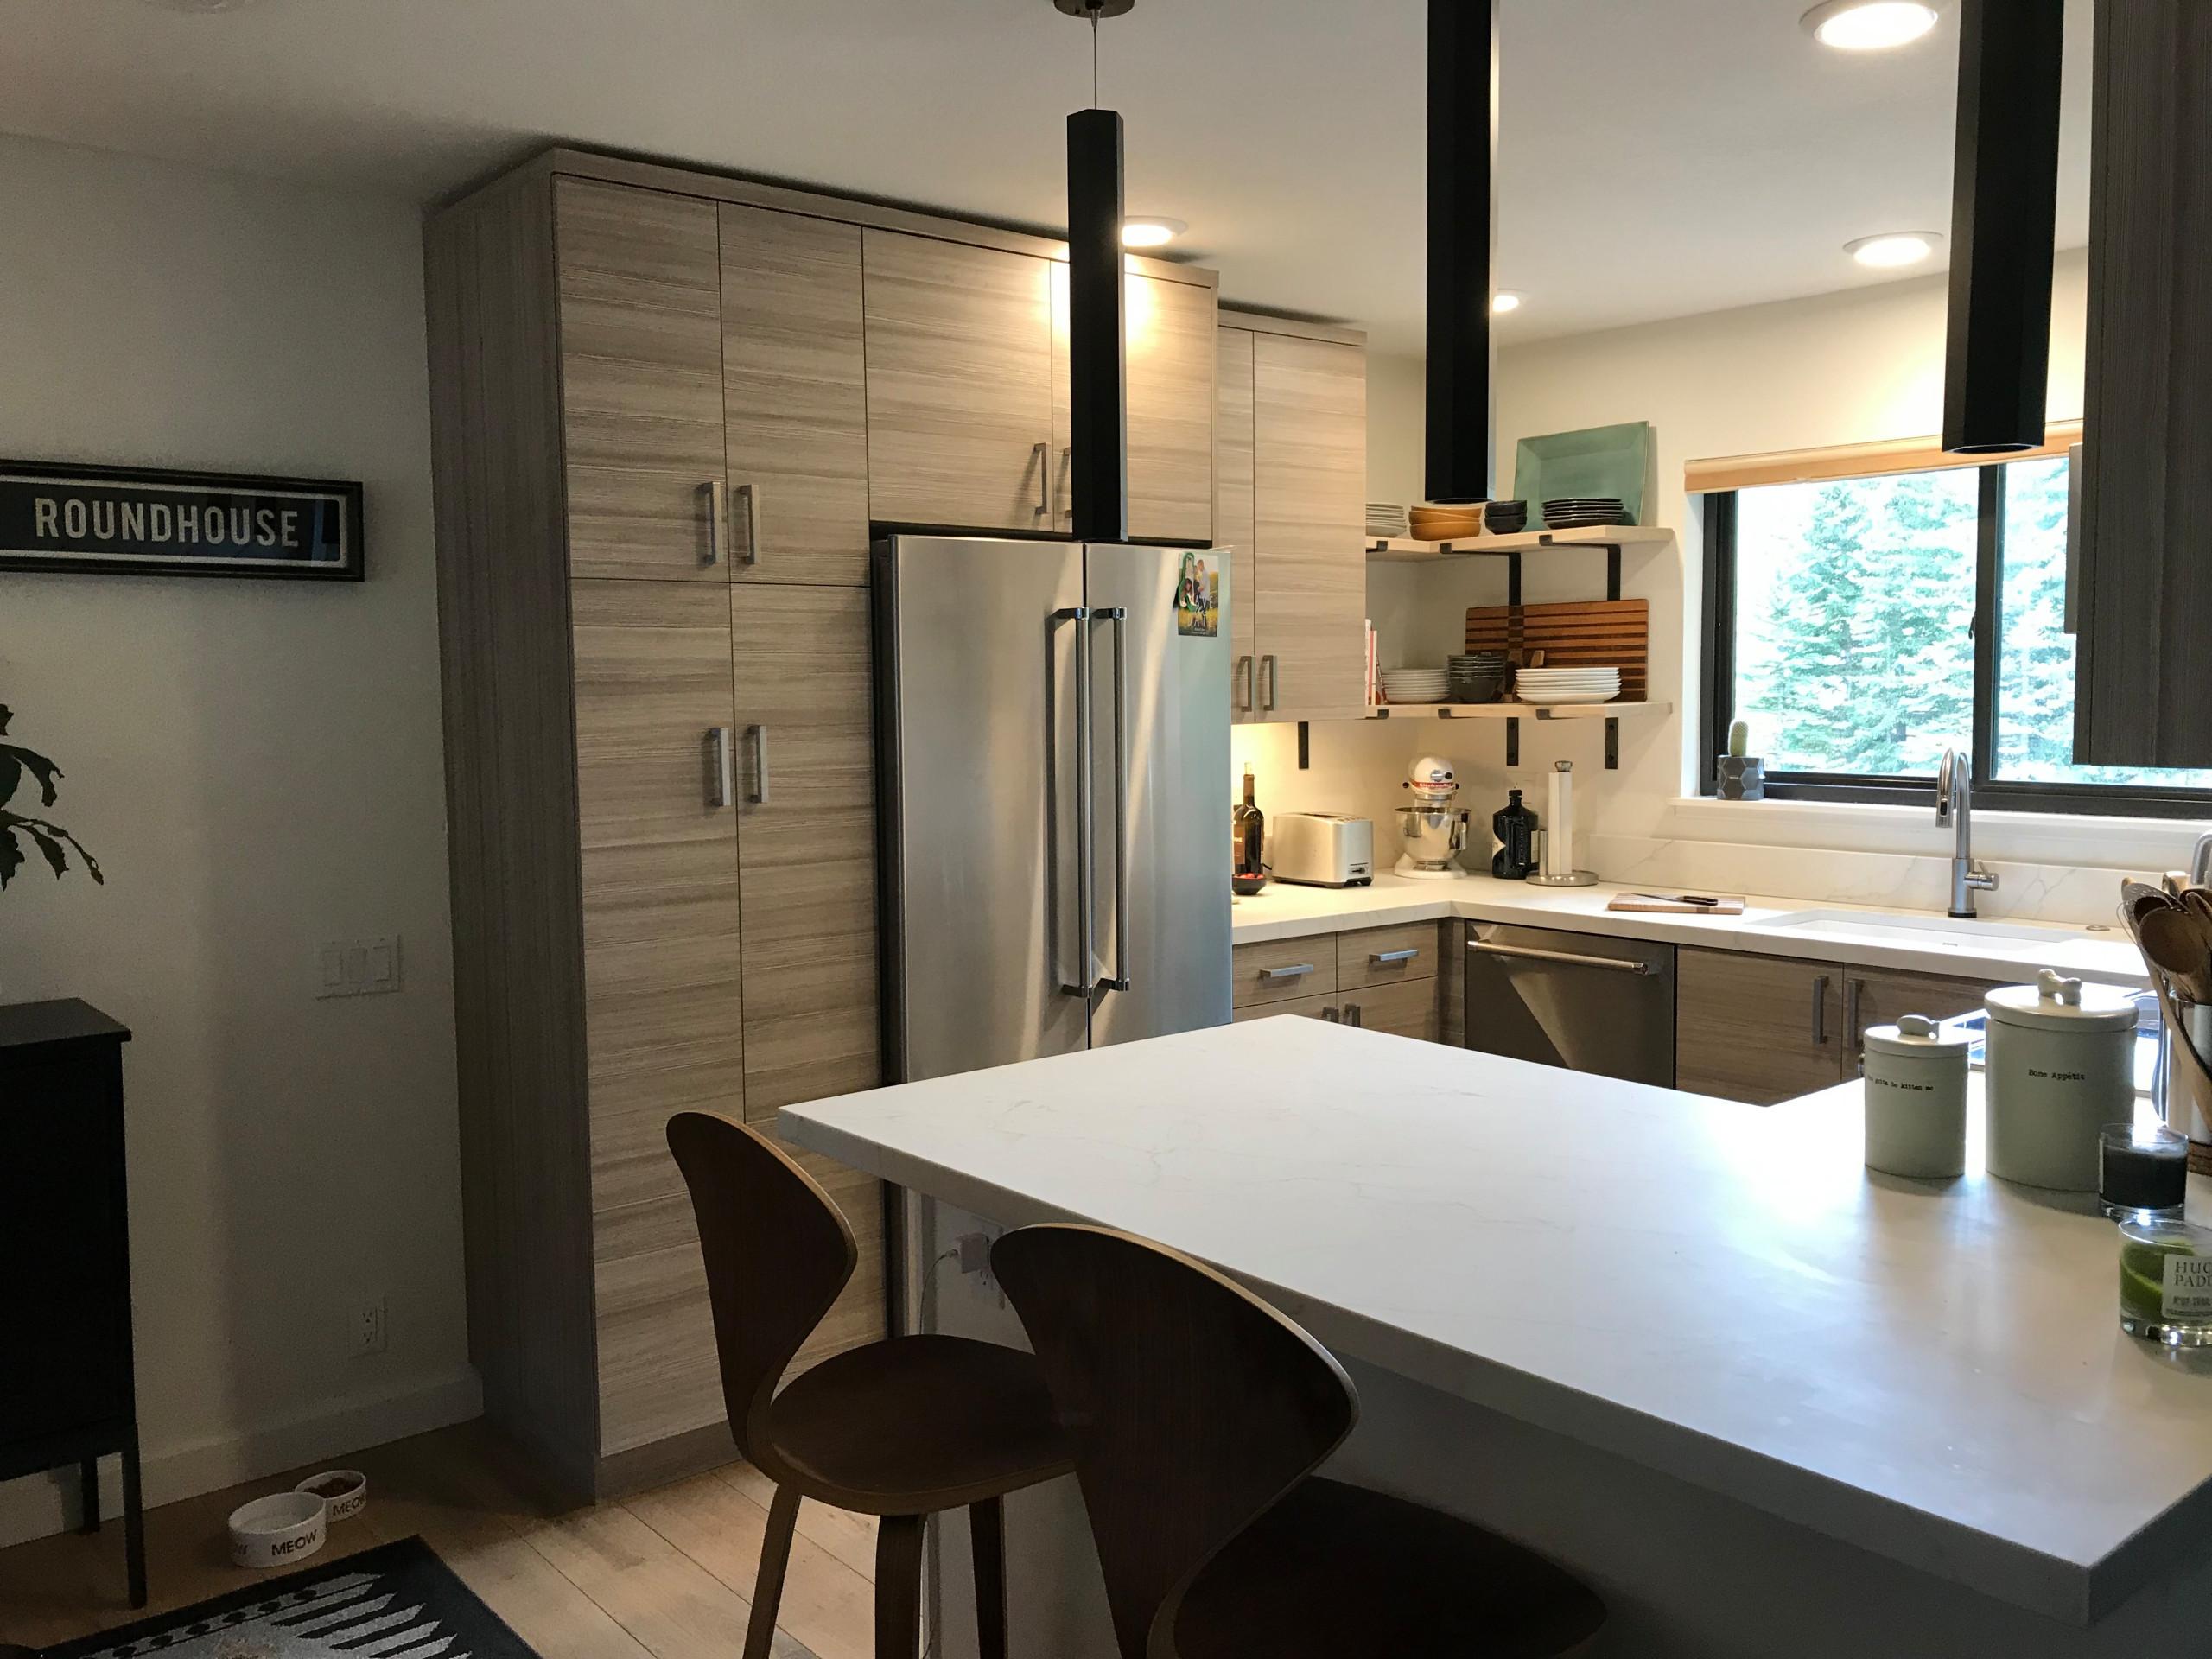 Elkorn Condo Kitchen Remodel